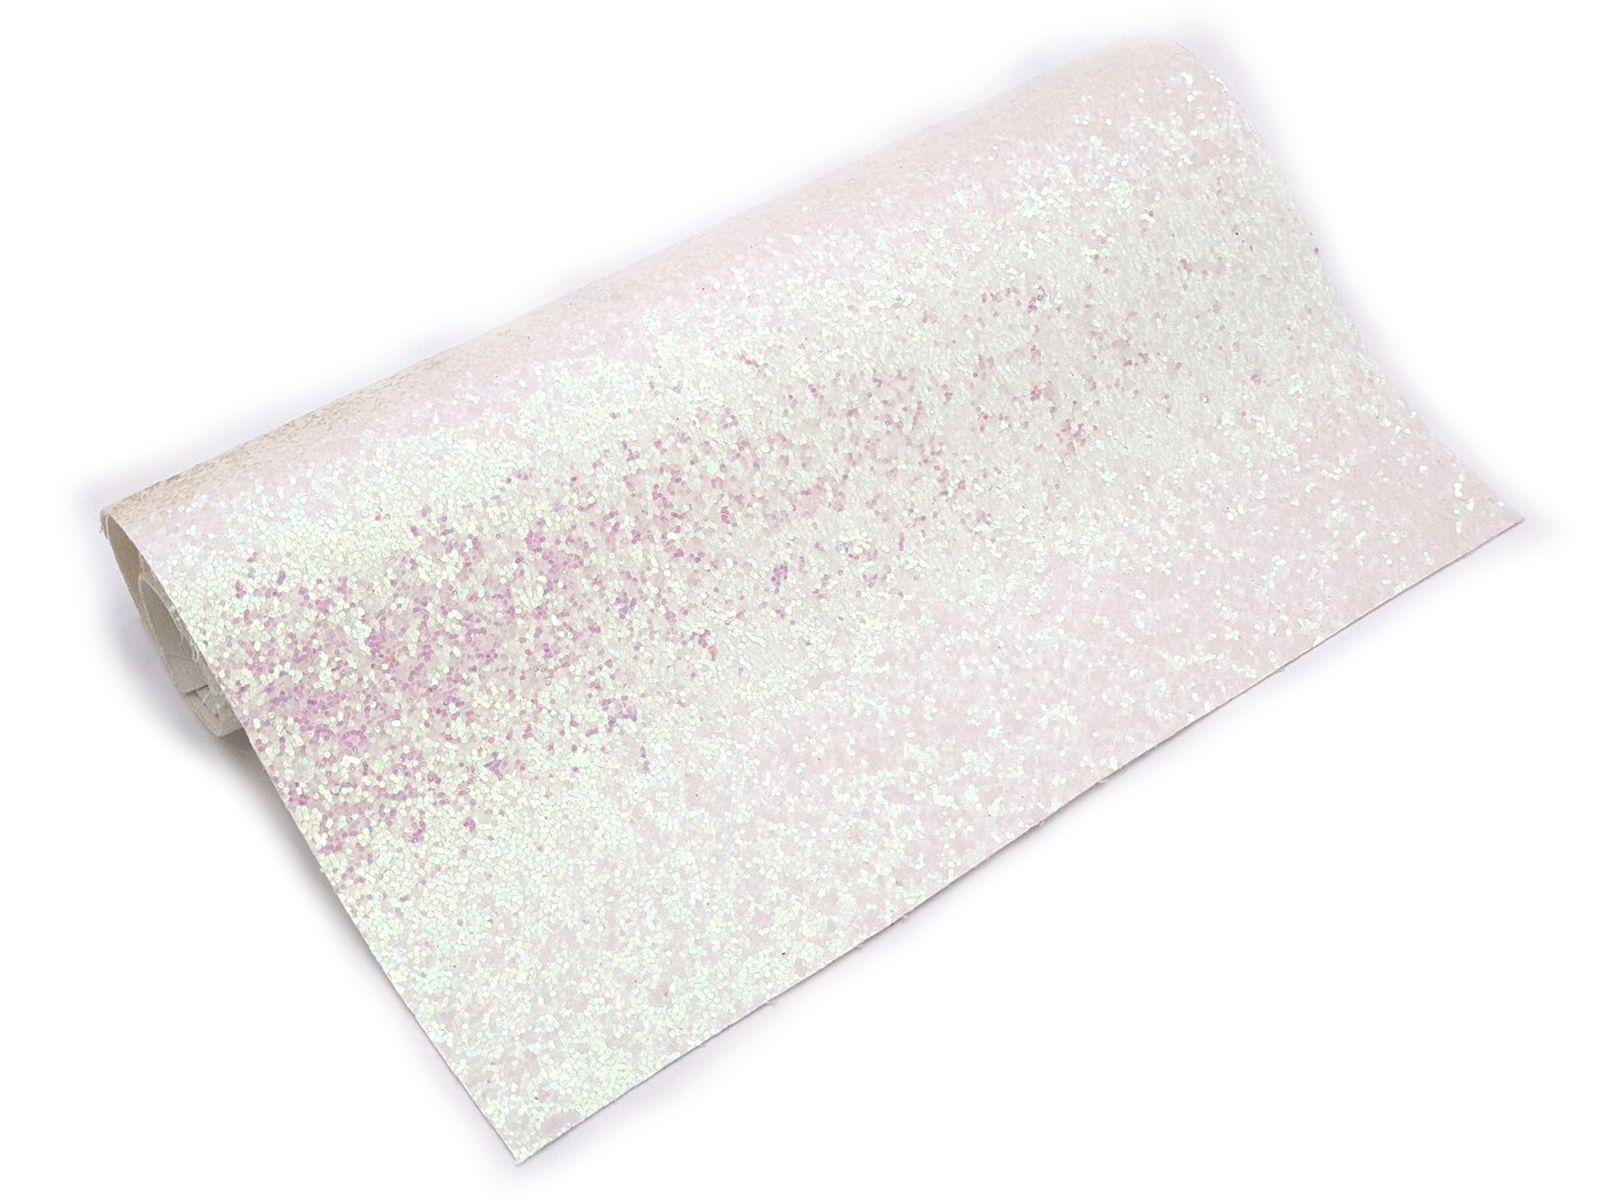 Lonita Glitter Branca - Furta Cor - Sublimação 65 Cm